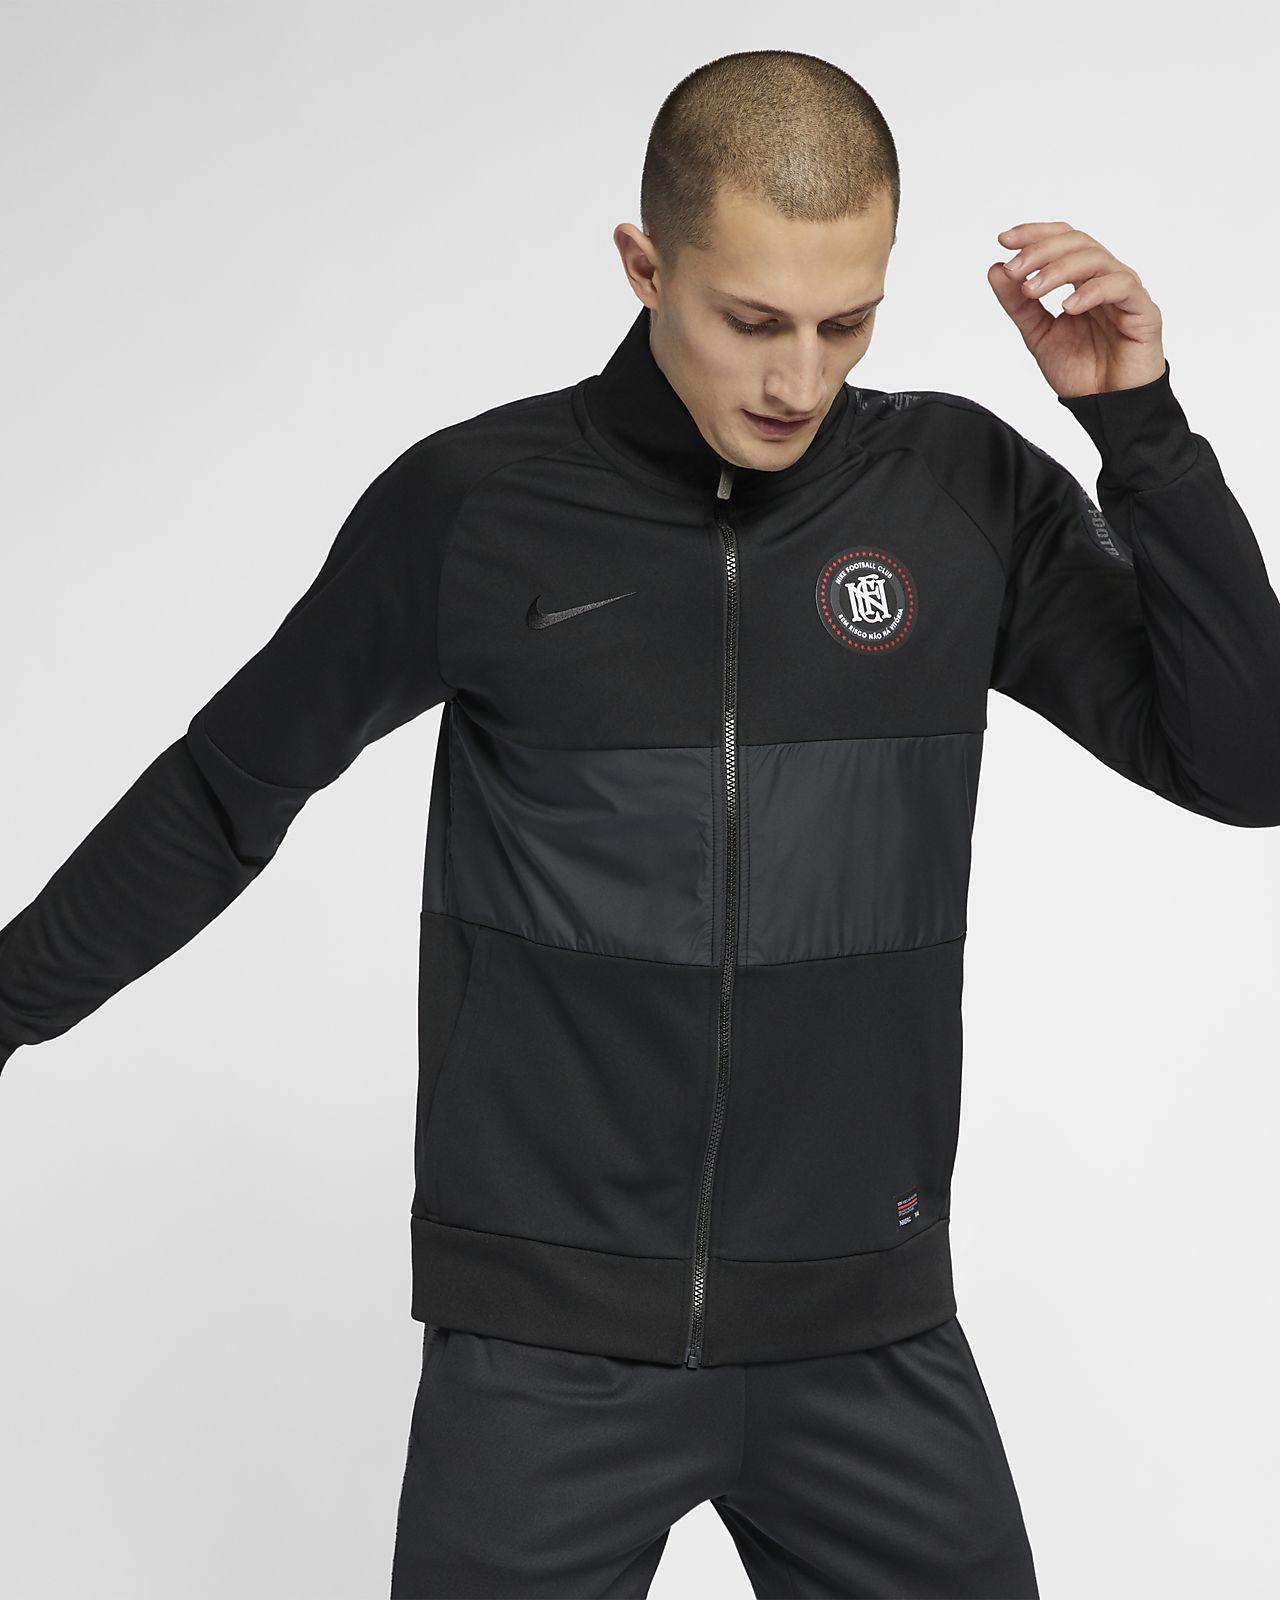 e5ea9127305b6 Nike F.C. Chaqueta de chándal de fútbol - Hombre. Nike.com ES